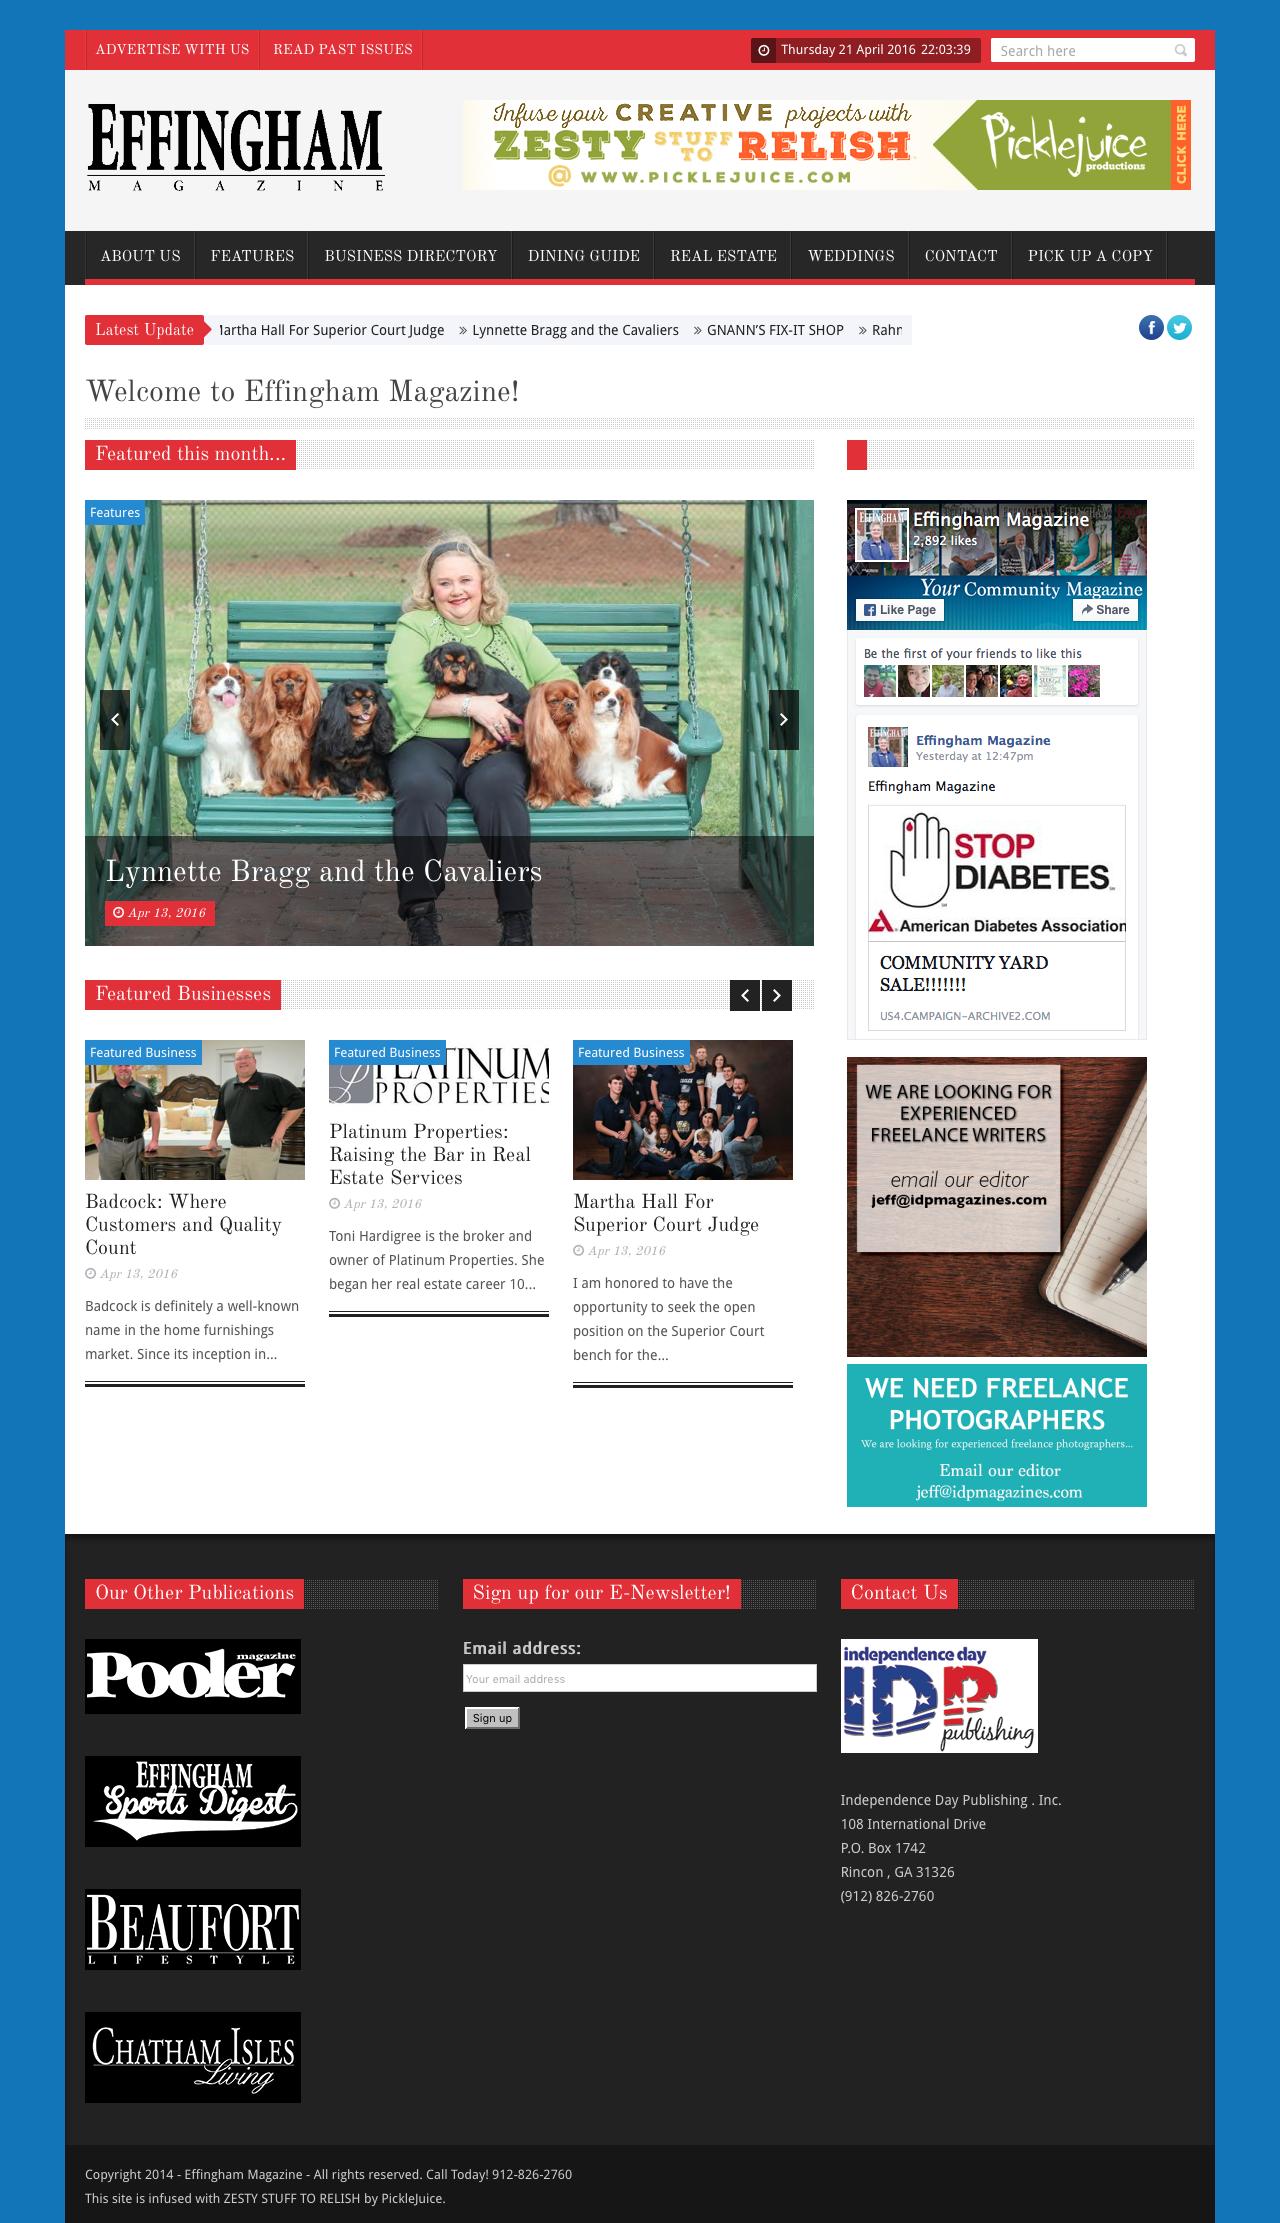 Effingham Magazine Web Design | PickleJuice Productions